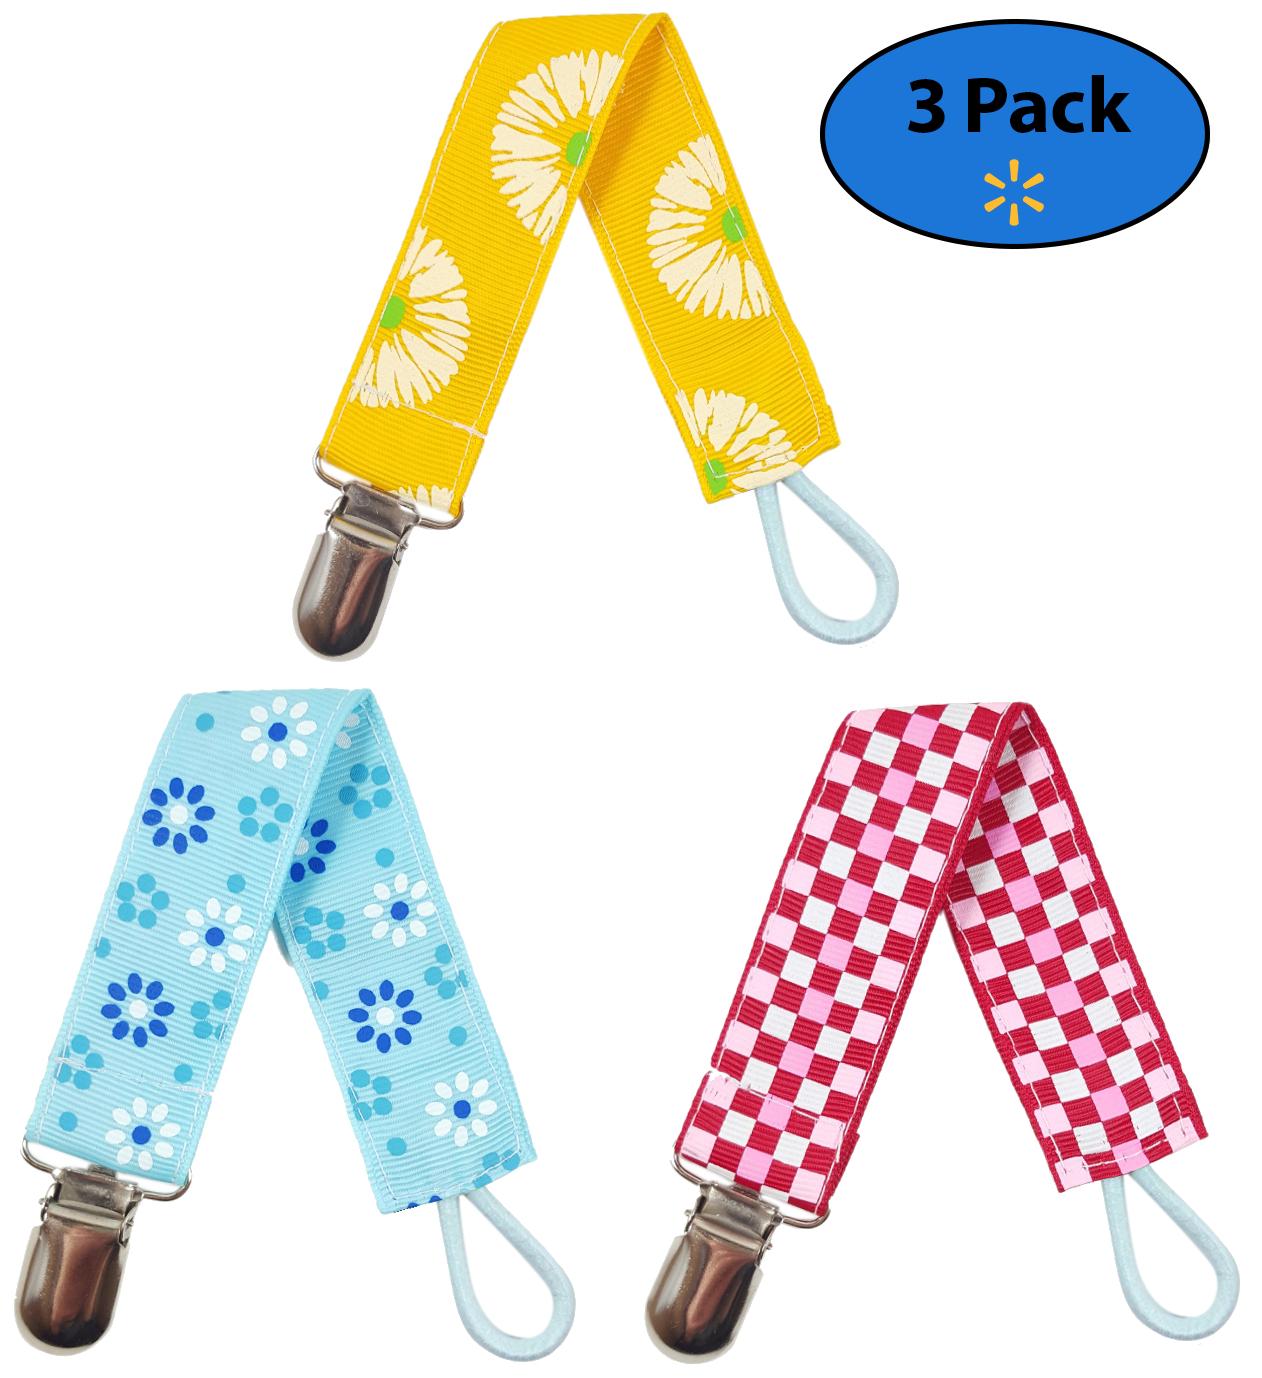 EliteBaby Unisex Pacifier Clip Holder, 3 Pack | Teething Toys, Soothie Pacifiers, Baby Blanket, & Baby Bibs | Stainless Steel Clasp | Baby Gift